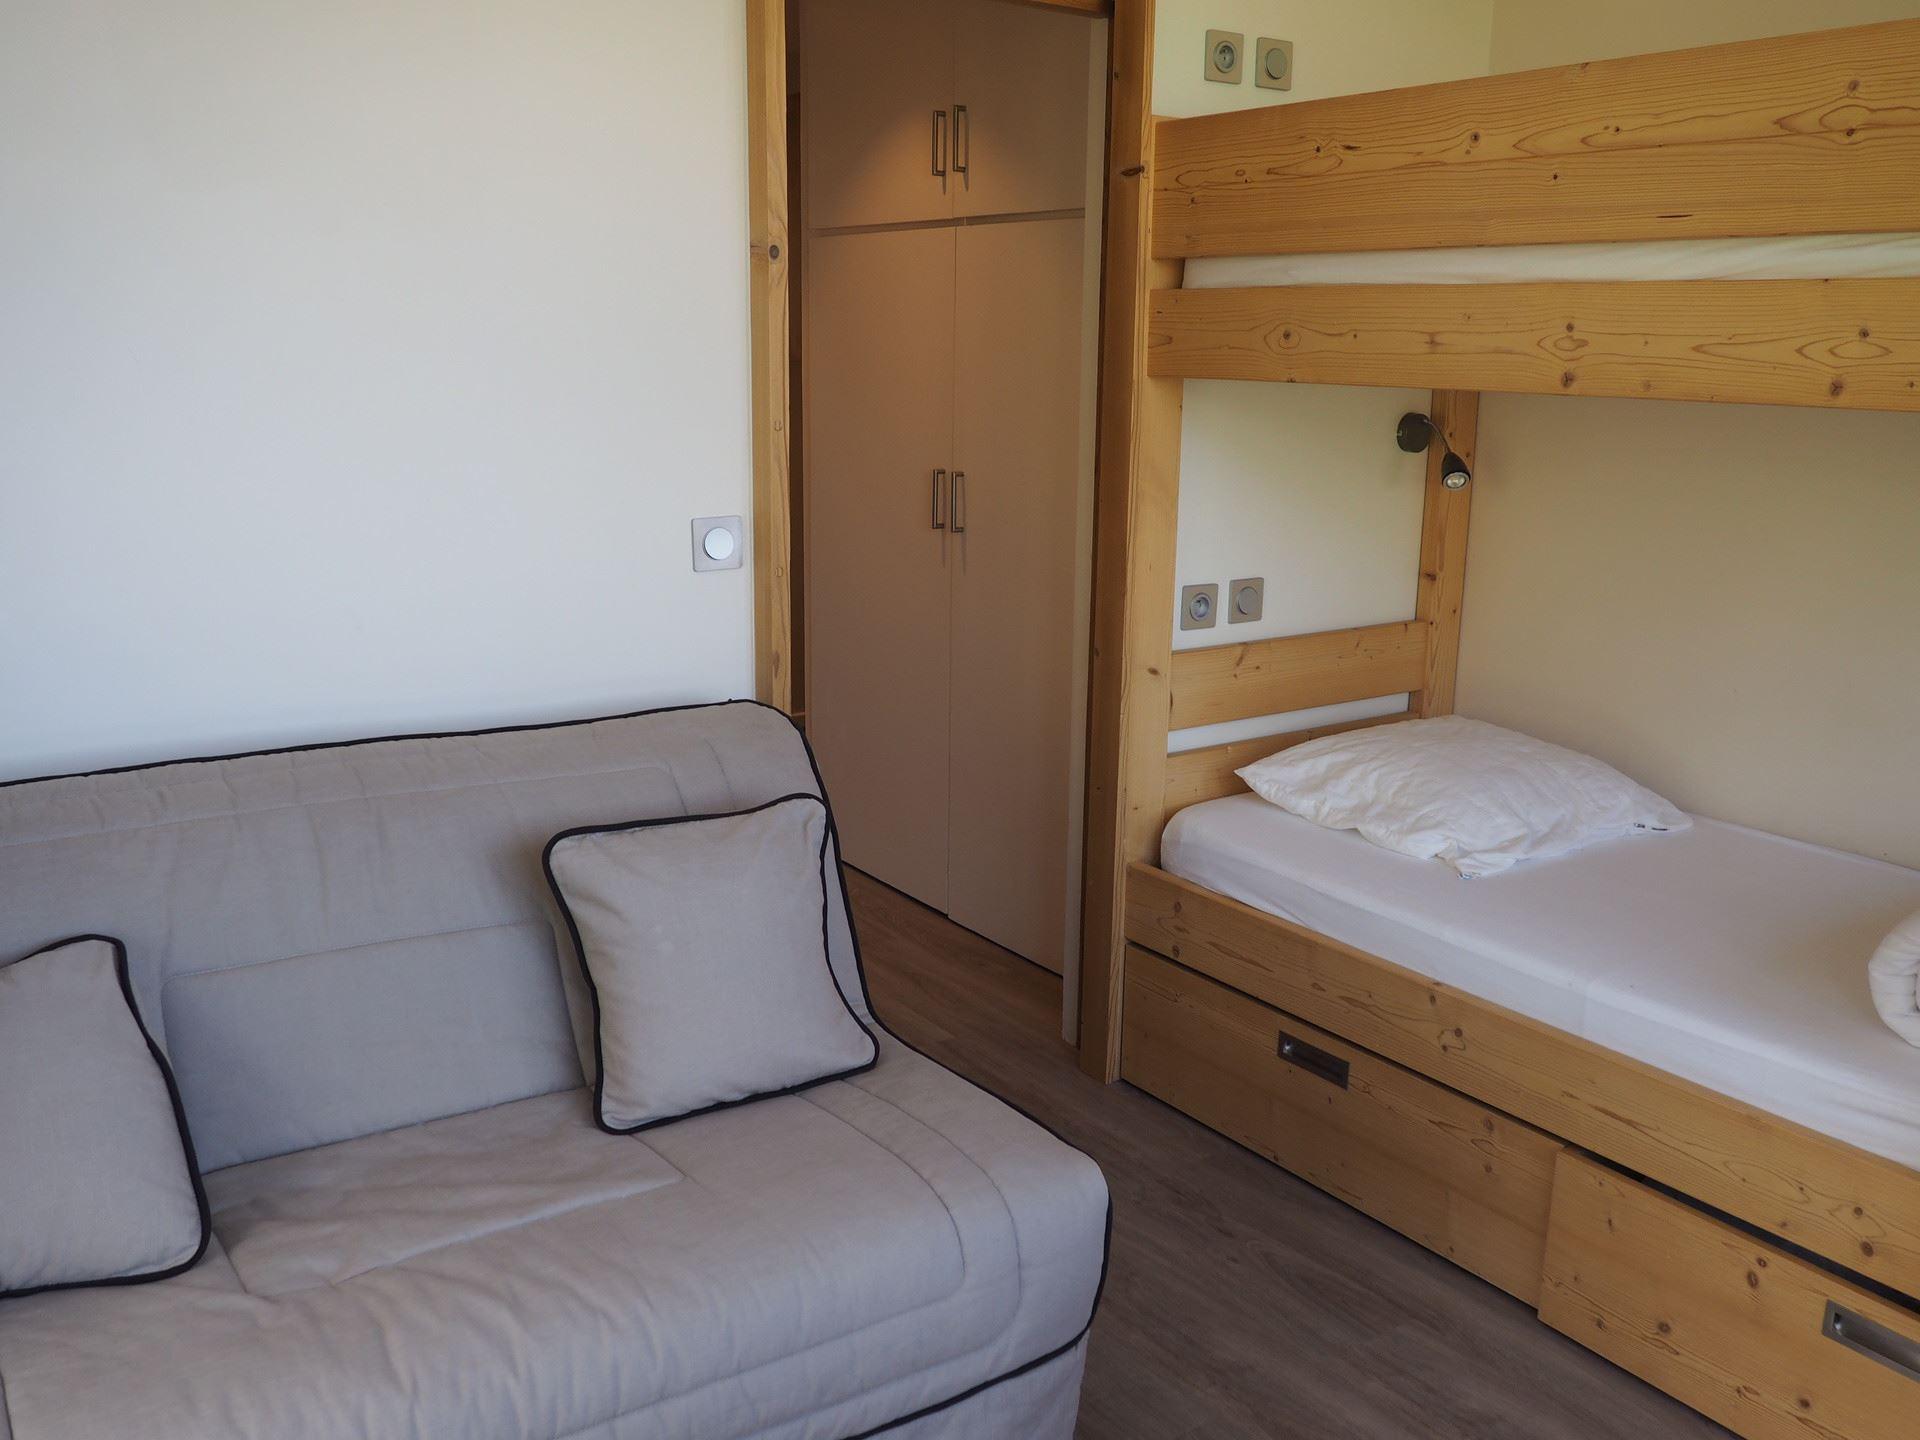 2 room 6 pers ski-in ski-out / DORONS 605